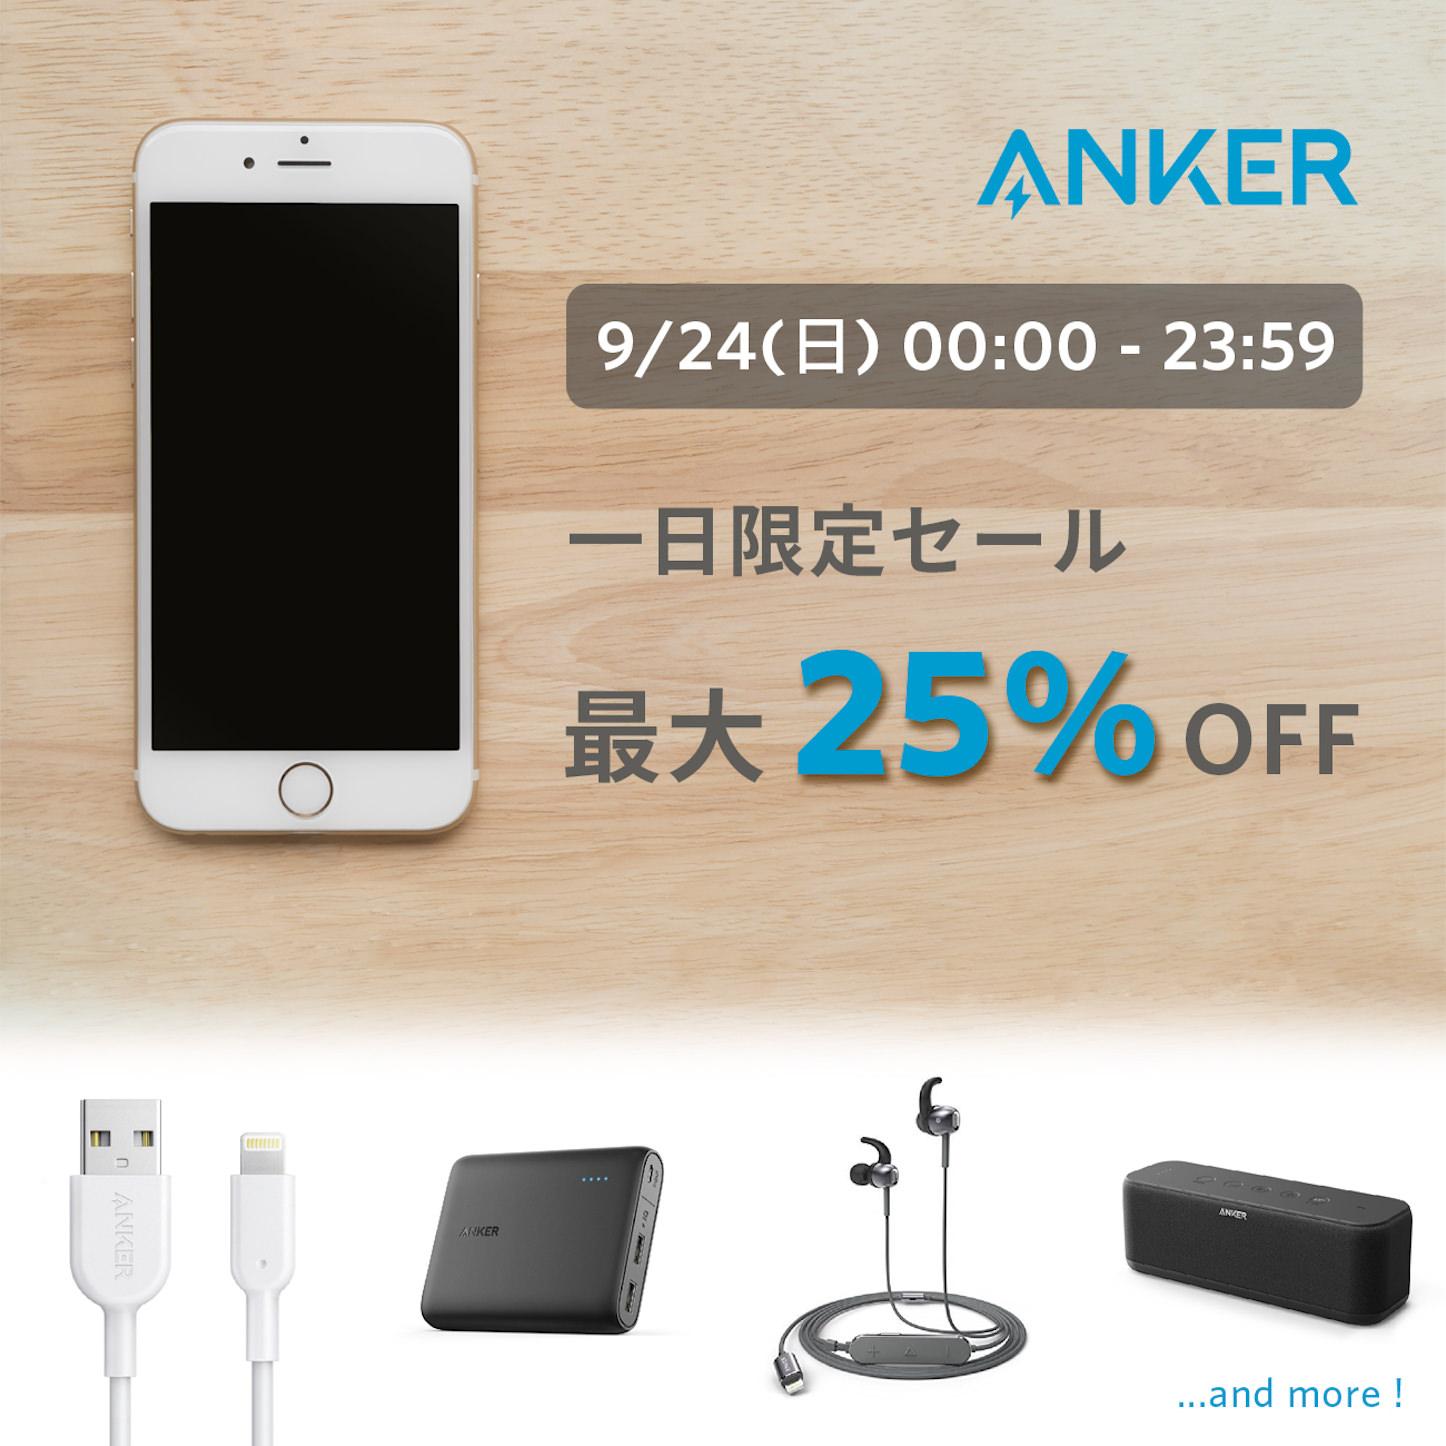 Anker 24 Sale